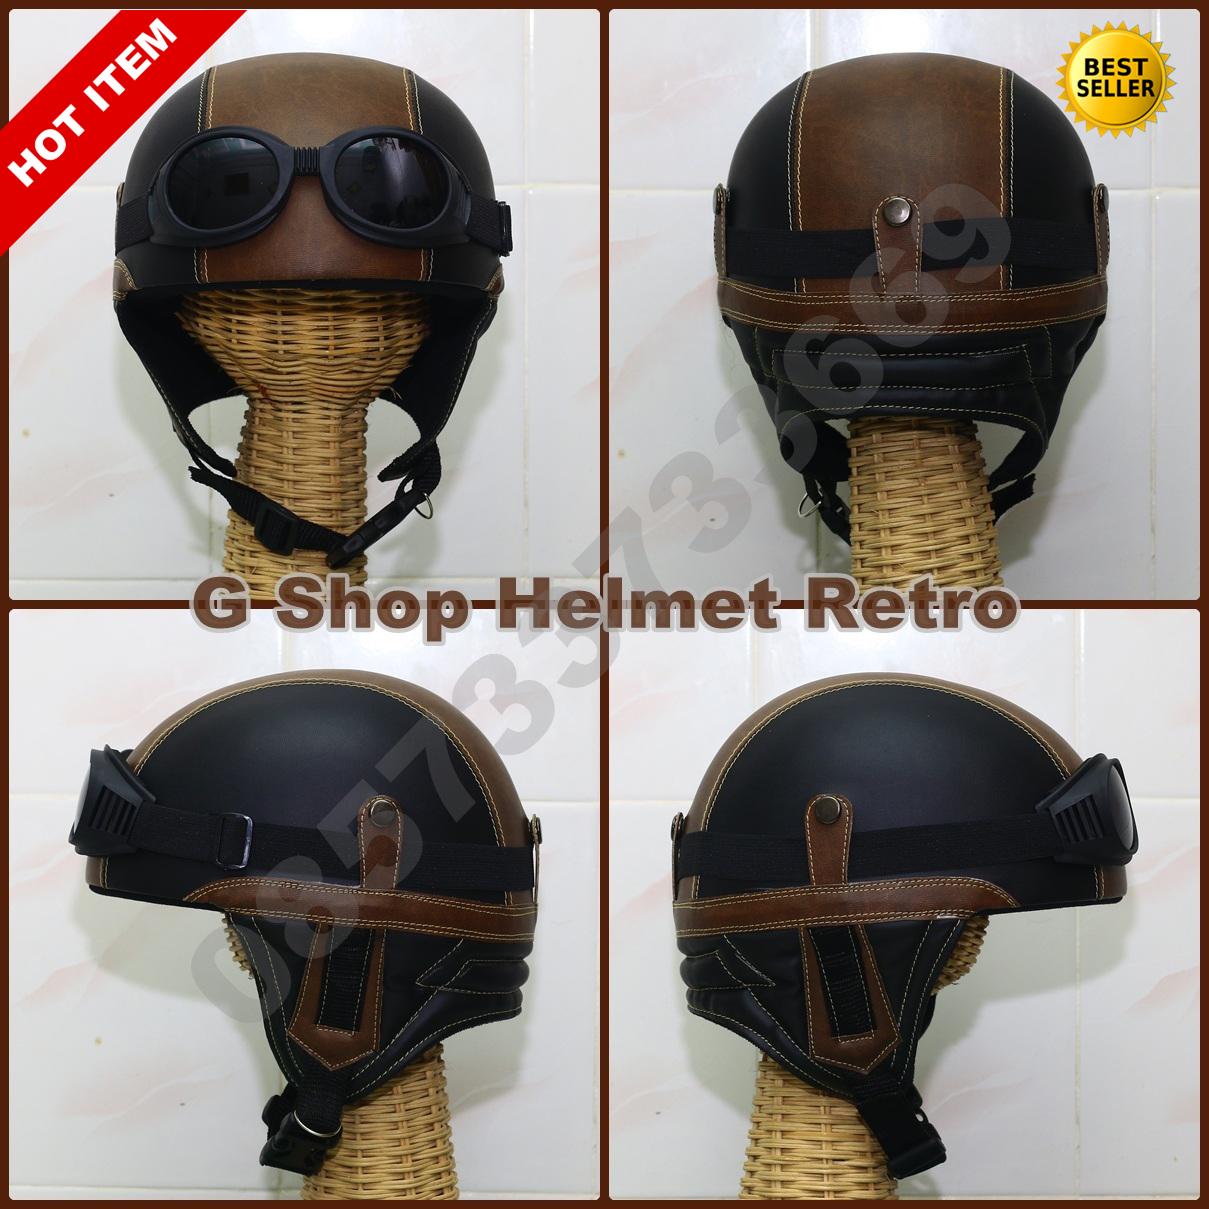 Helm Retro Jadul Chips Hitam Cokelat (vespa,cb,ulung)